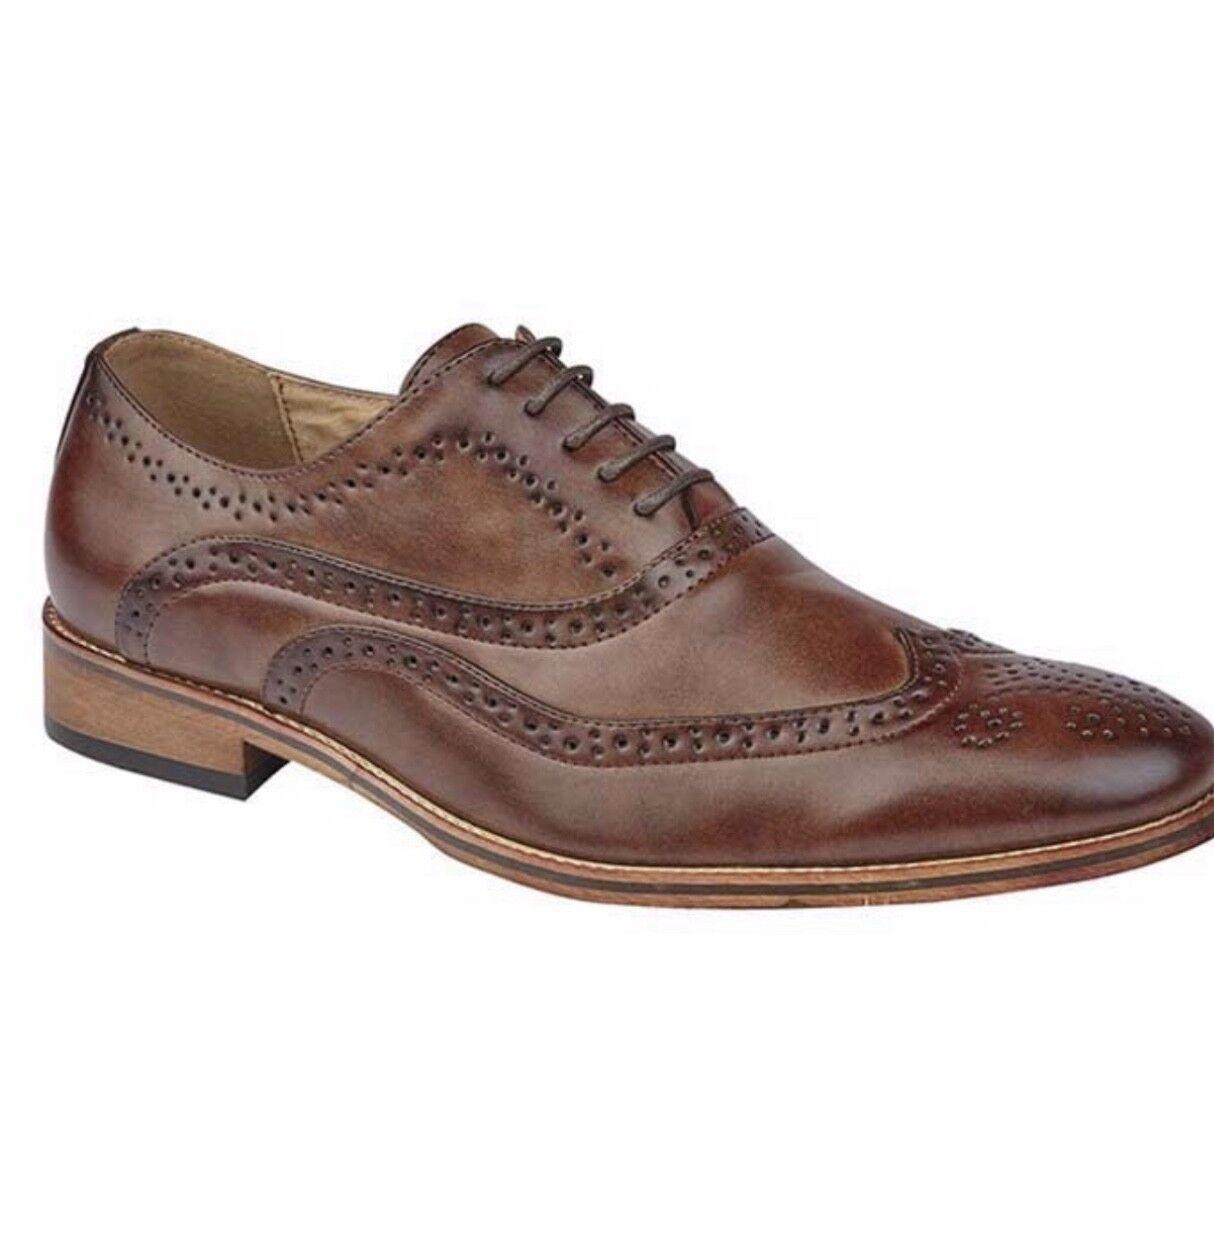 Goor  Brown Brogue shoe. Great comfortable gents shoe. Ideal for a Wedding etc